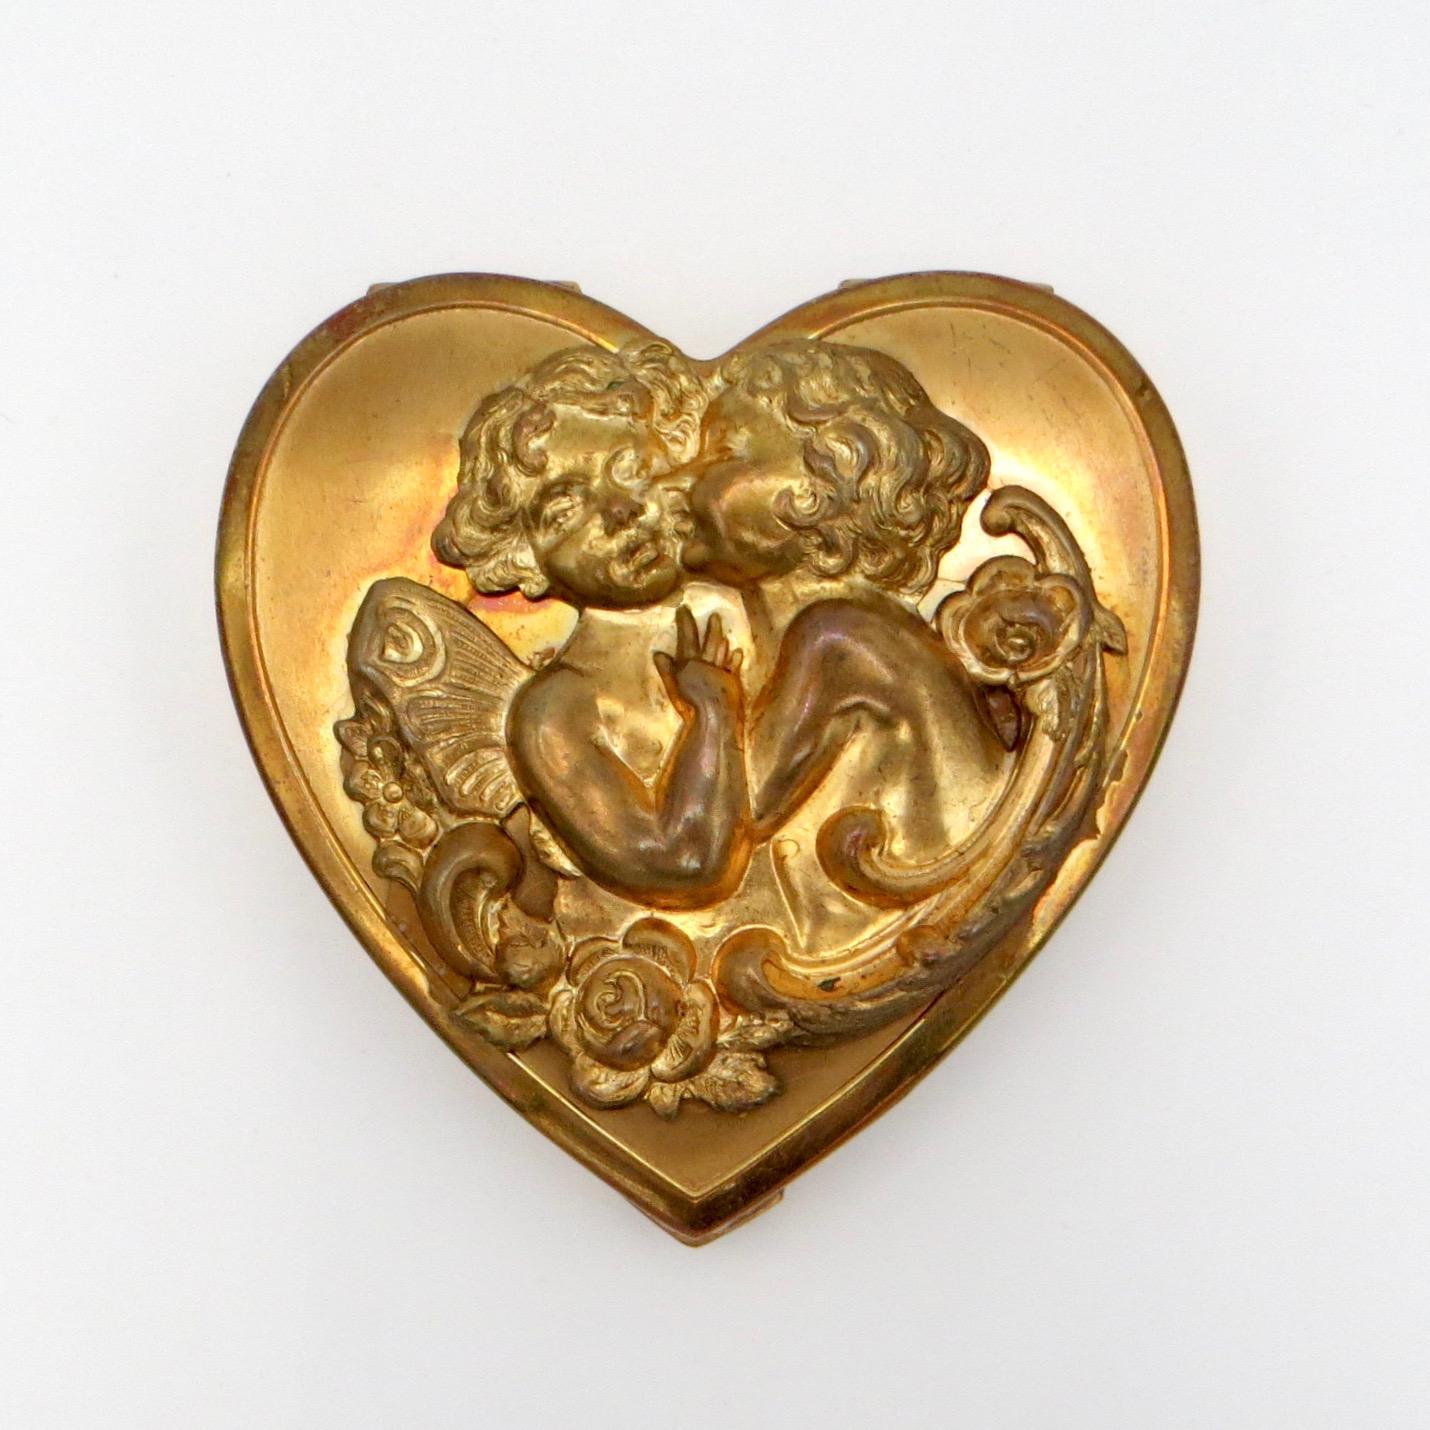 Cherub Heart Compact